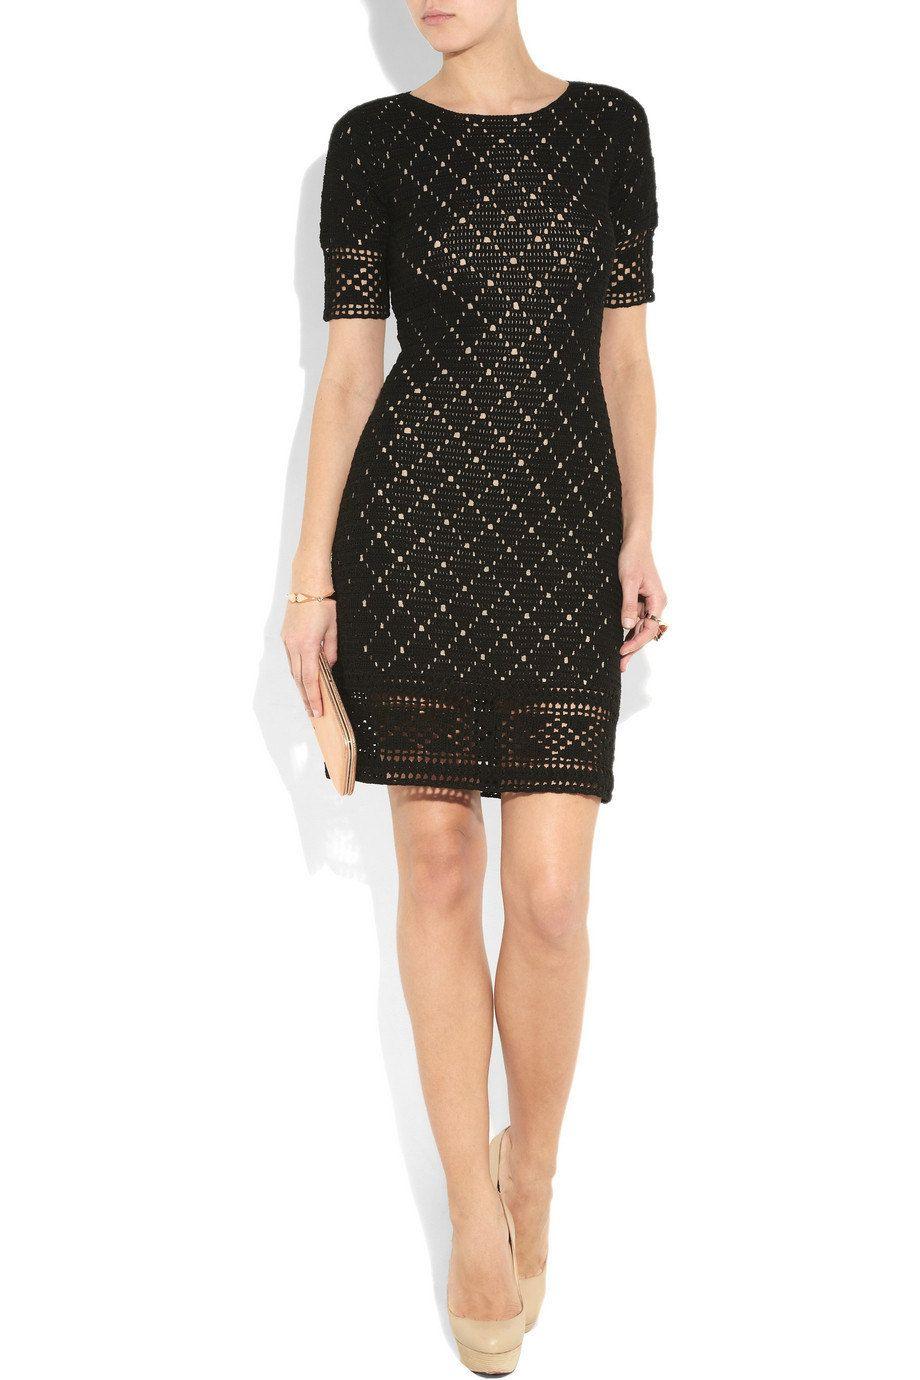 Crochet dress PATTERN, designer crochet dress pattern, detailed ...